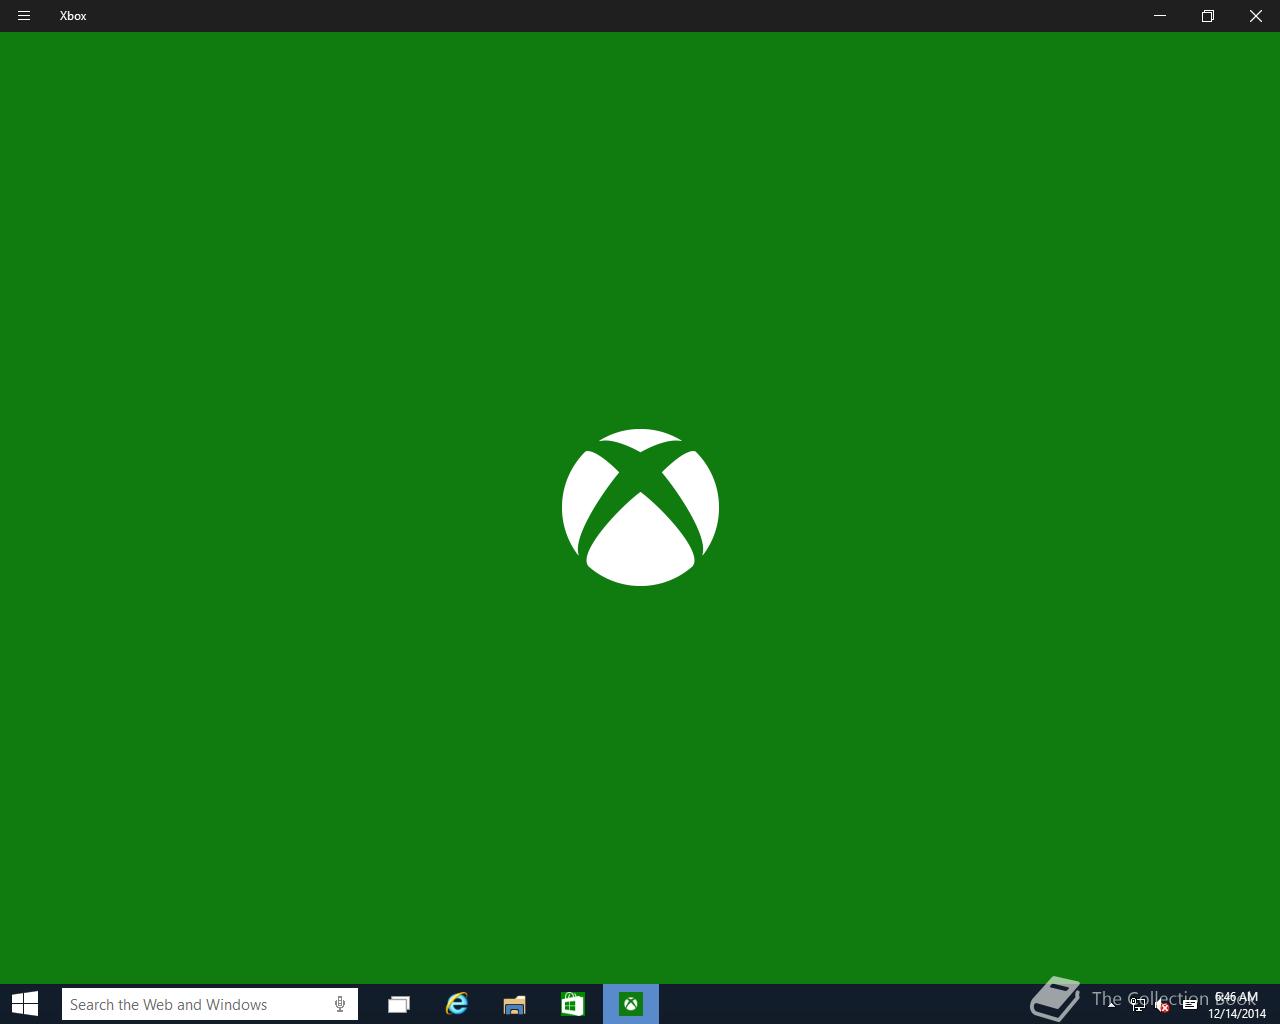 Windows 10 Has a New Xbox App and Cortana Integration -- Report